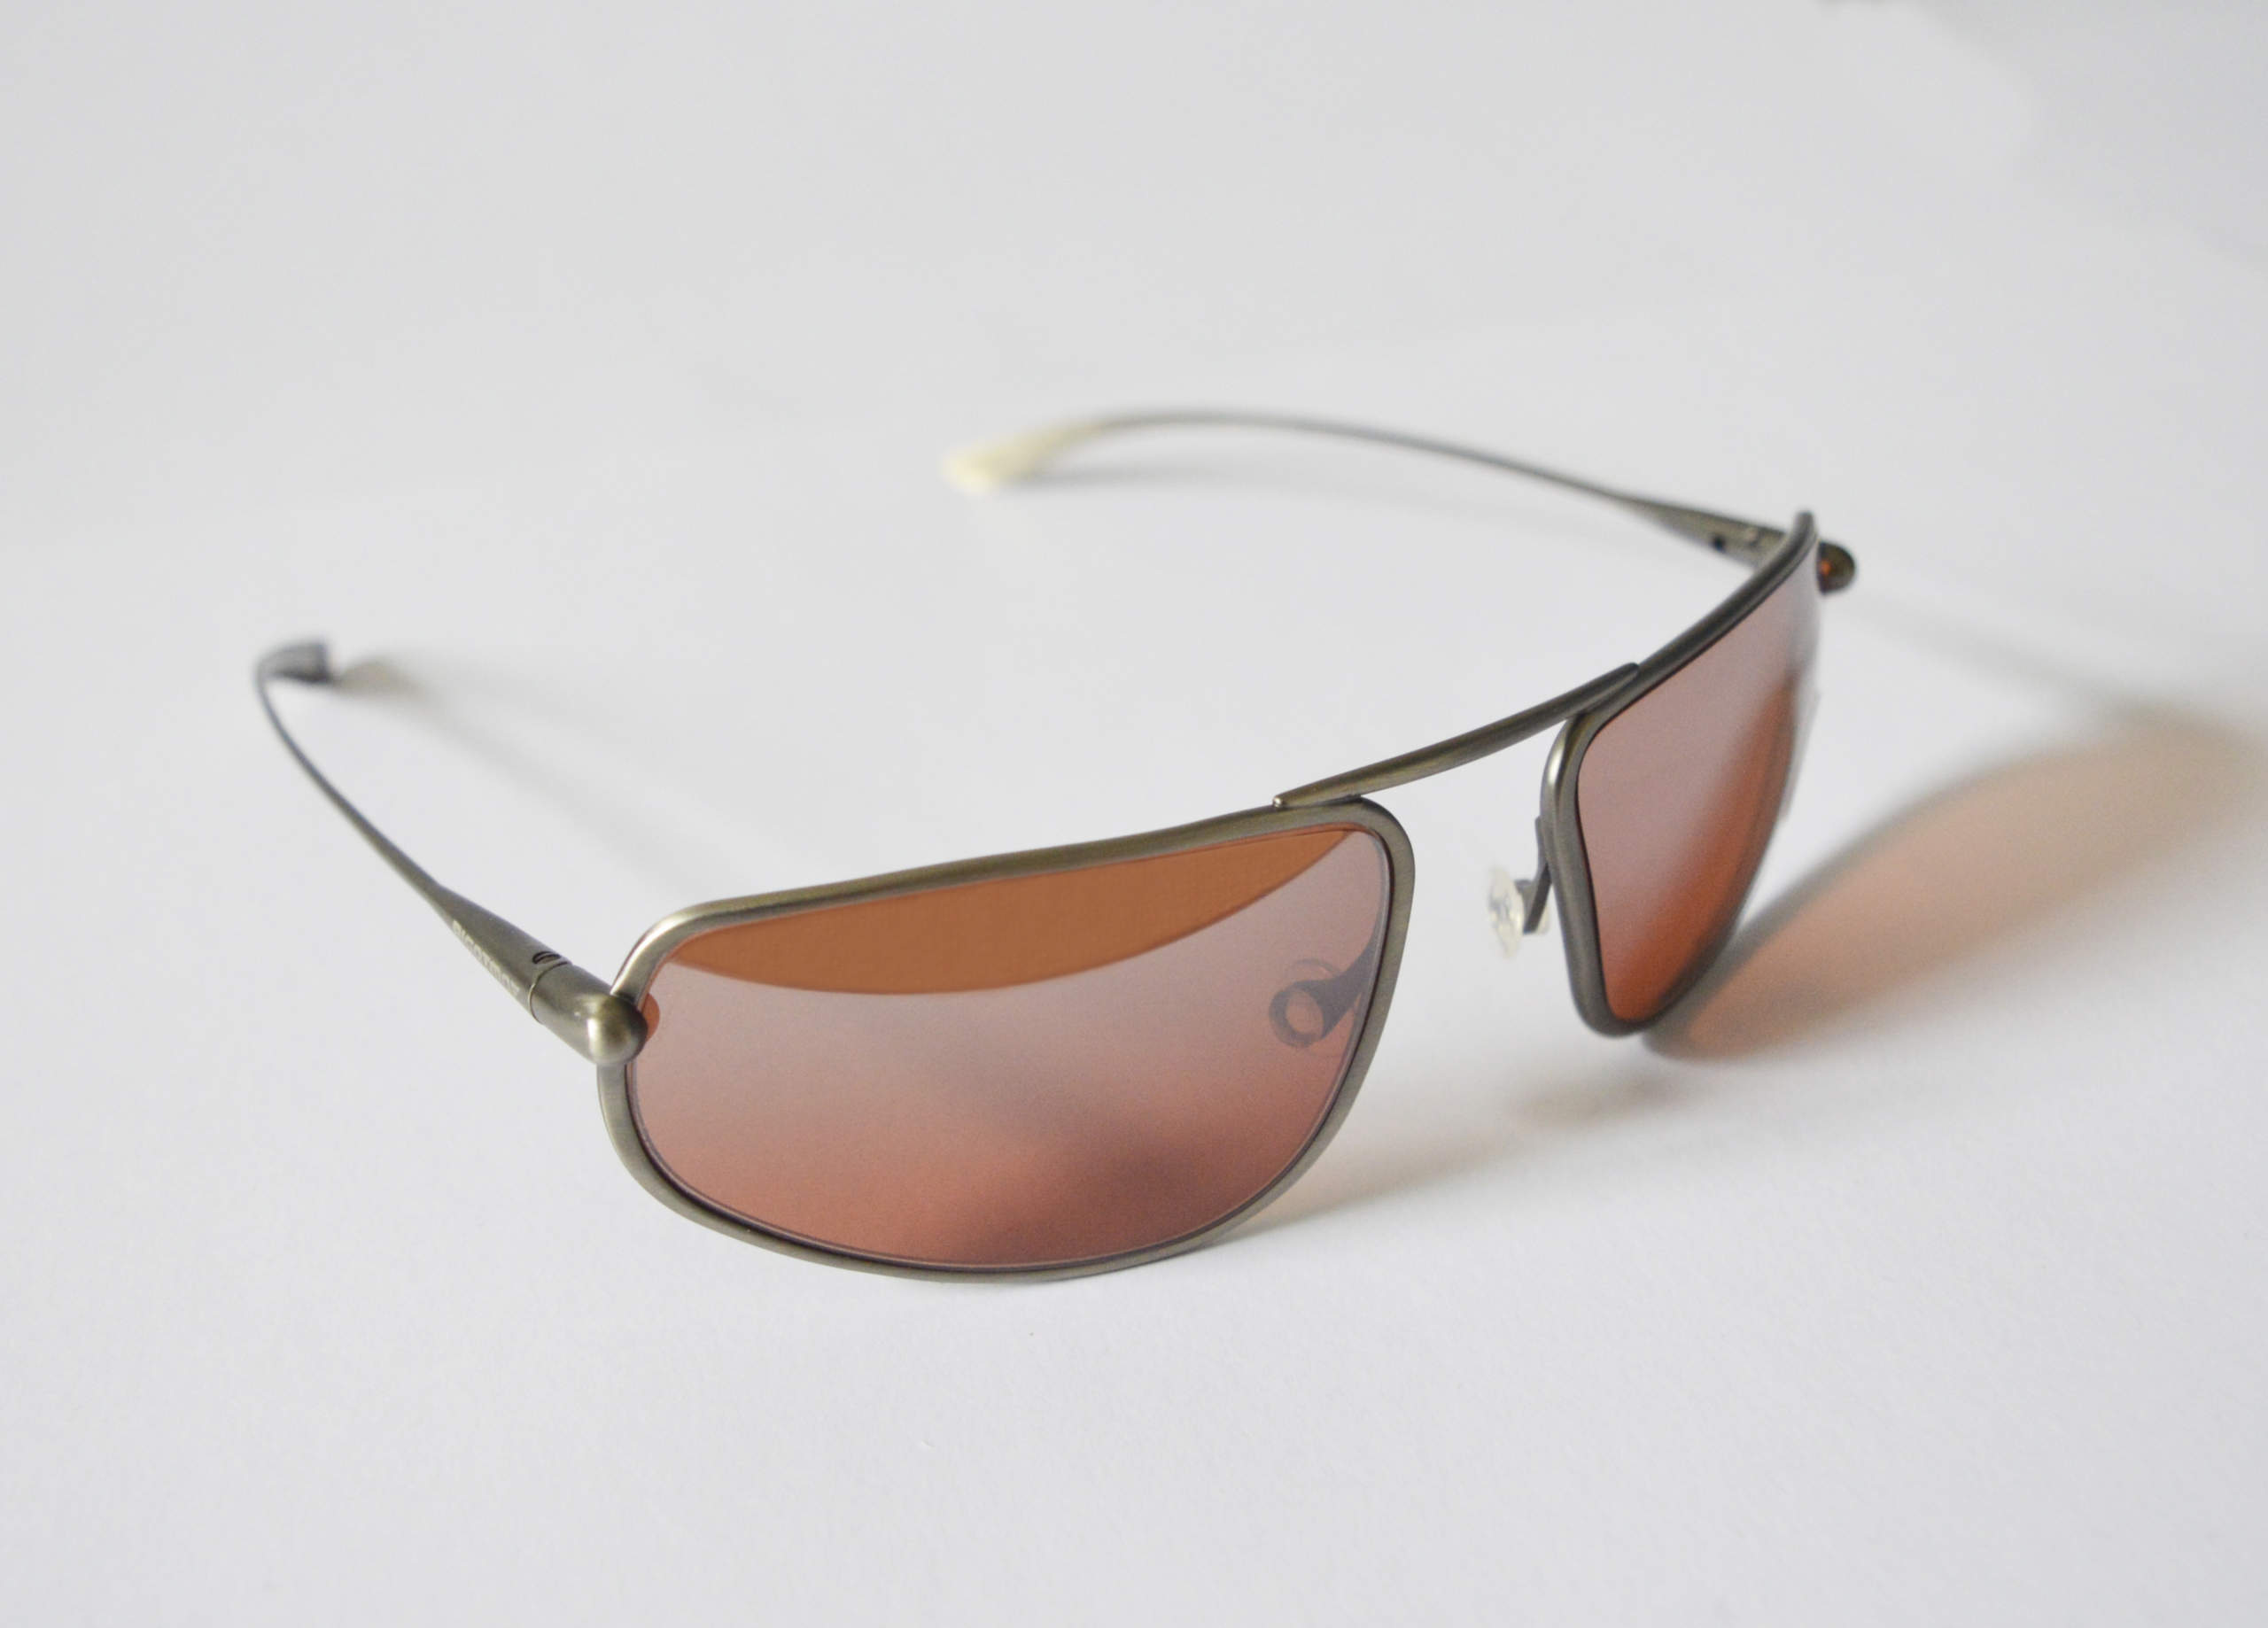 Strato - Natural Titanium Frame Silver Gradient Mirror Copper/Brown Photochromic Sunglasses